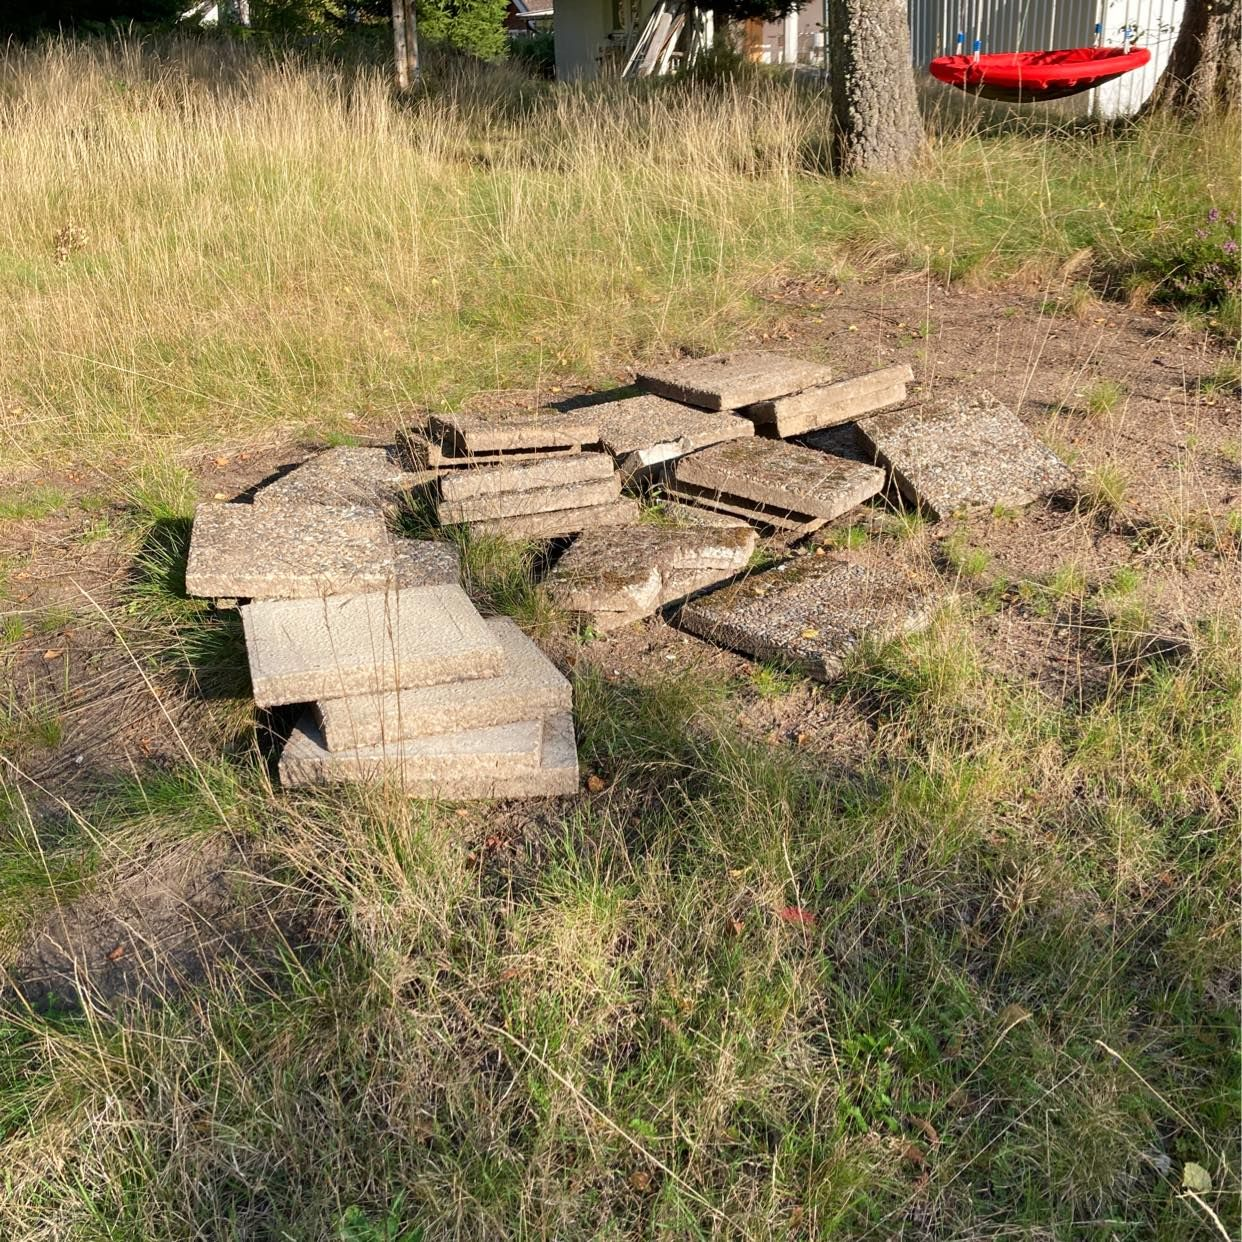 image of Bring to scrapyard - Älmhult